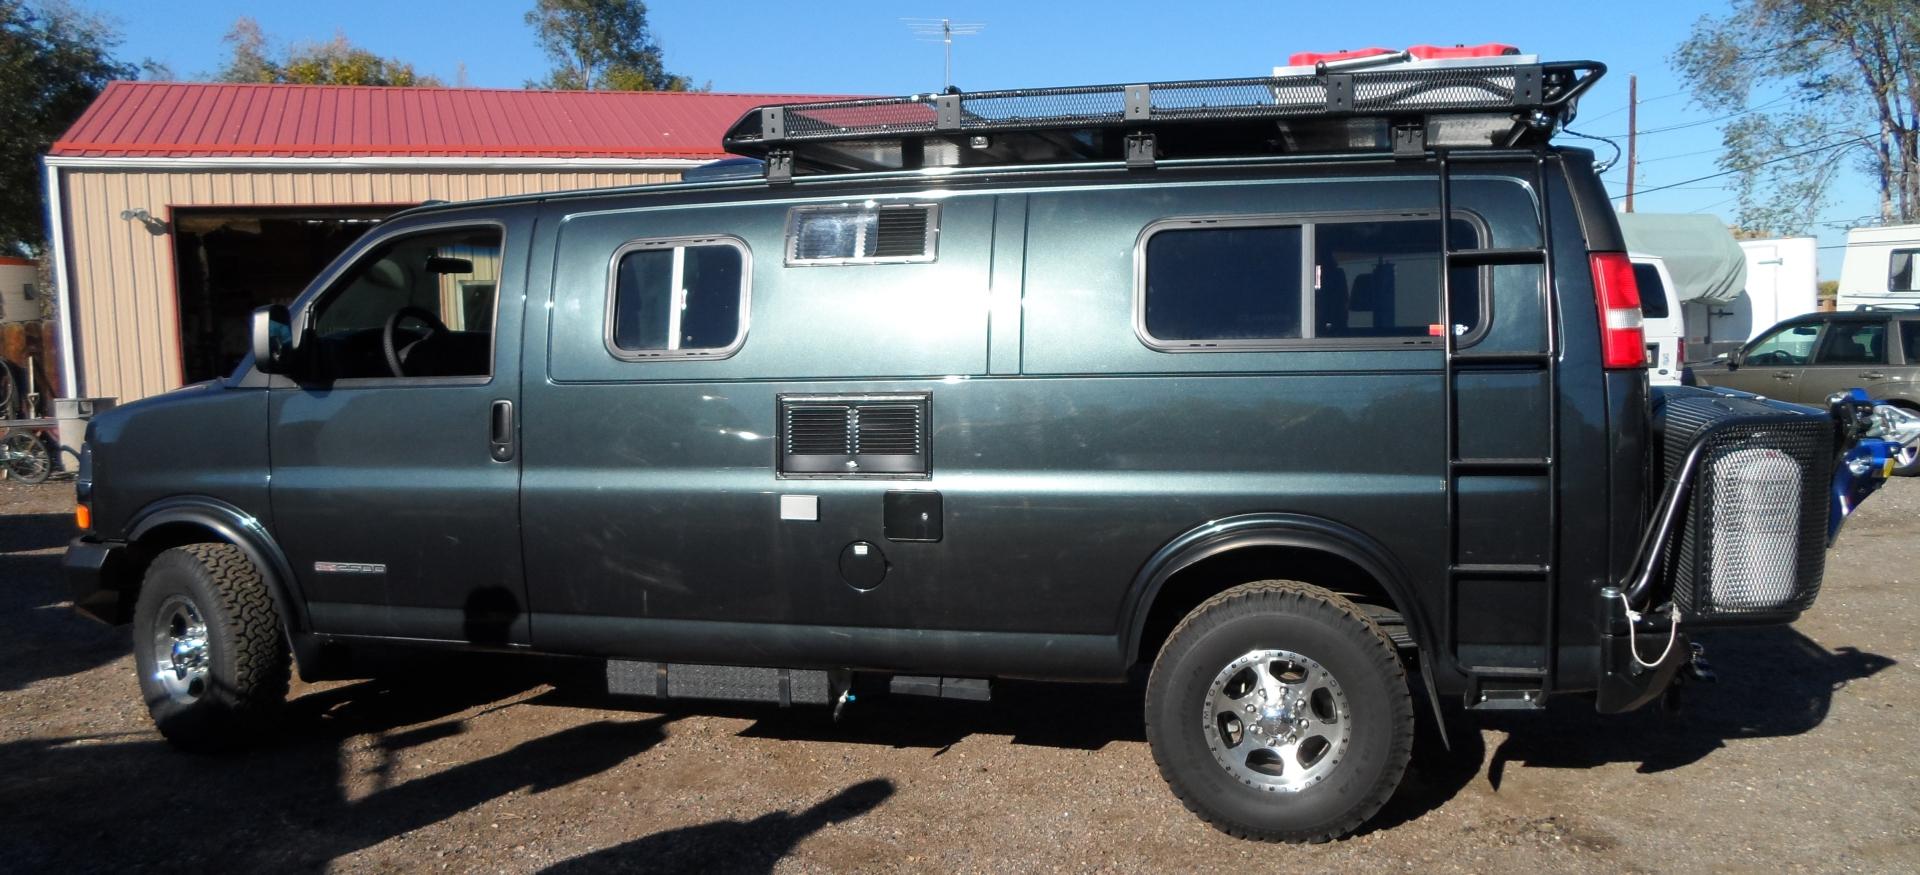 Custom Chevy Express Camper Van